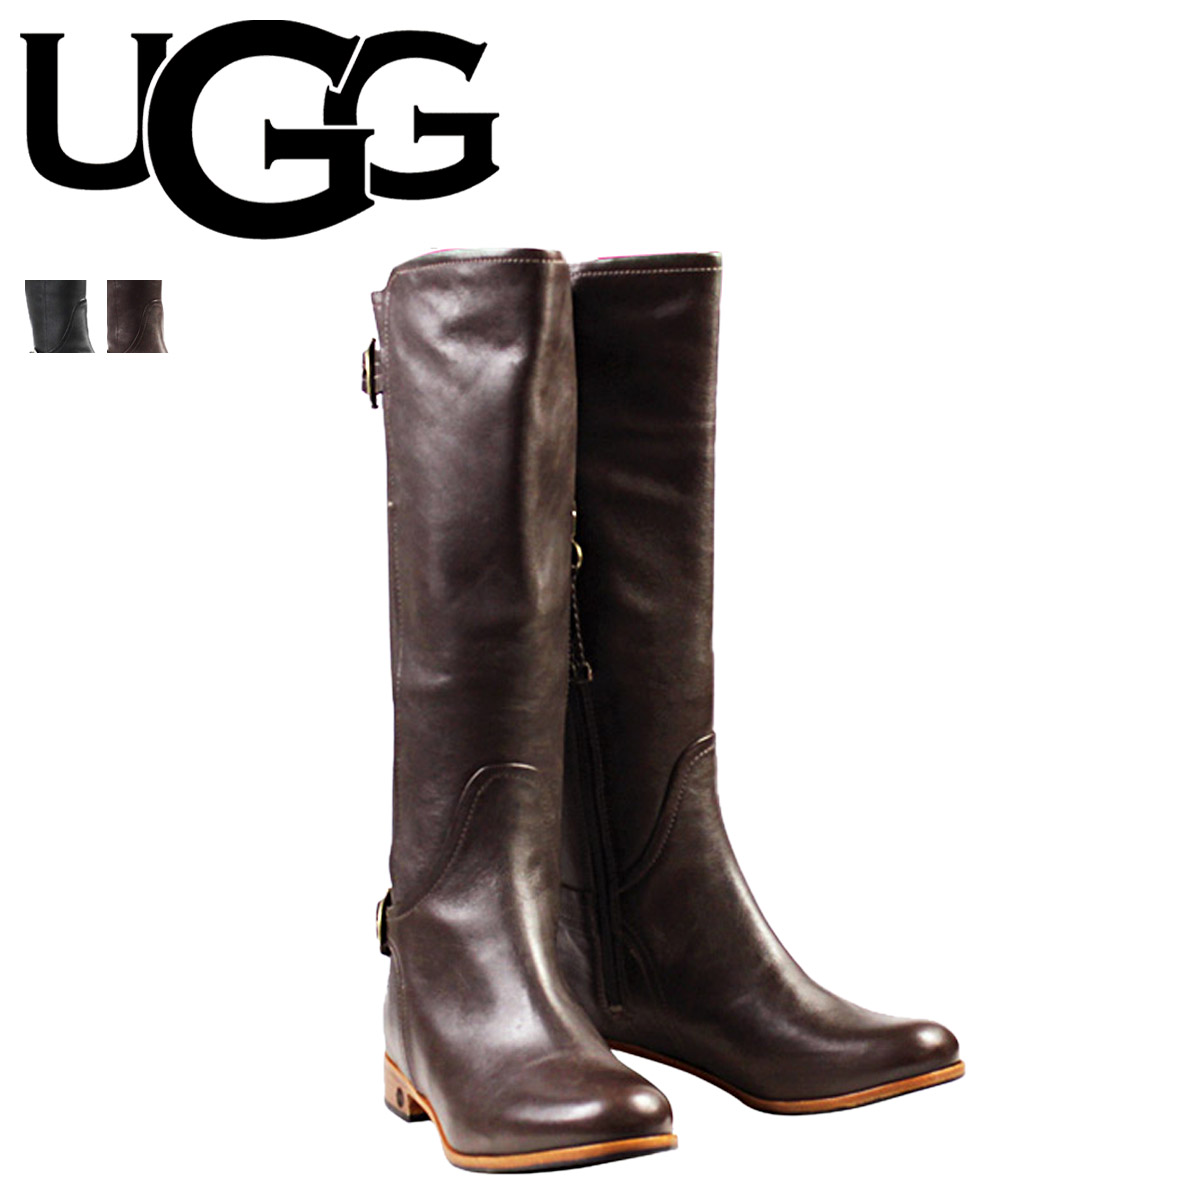 Allsports Ugg Ugg Womens Amberley Boots Black Womens -6268